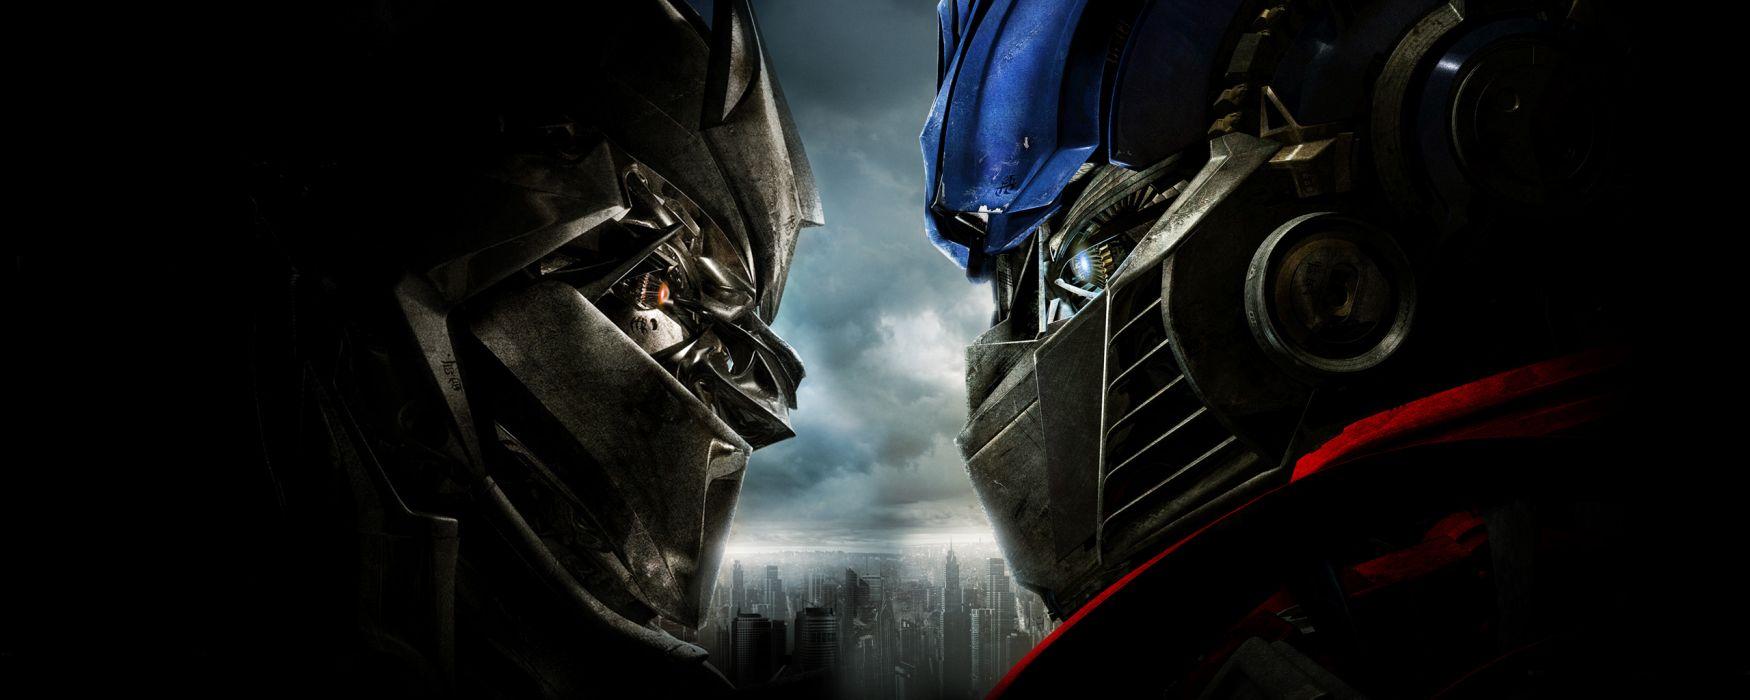 Optimus Prime Megatron Transformers 2 - Revenge of the Fallen wallpaper